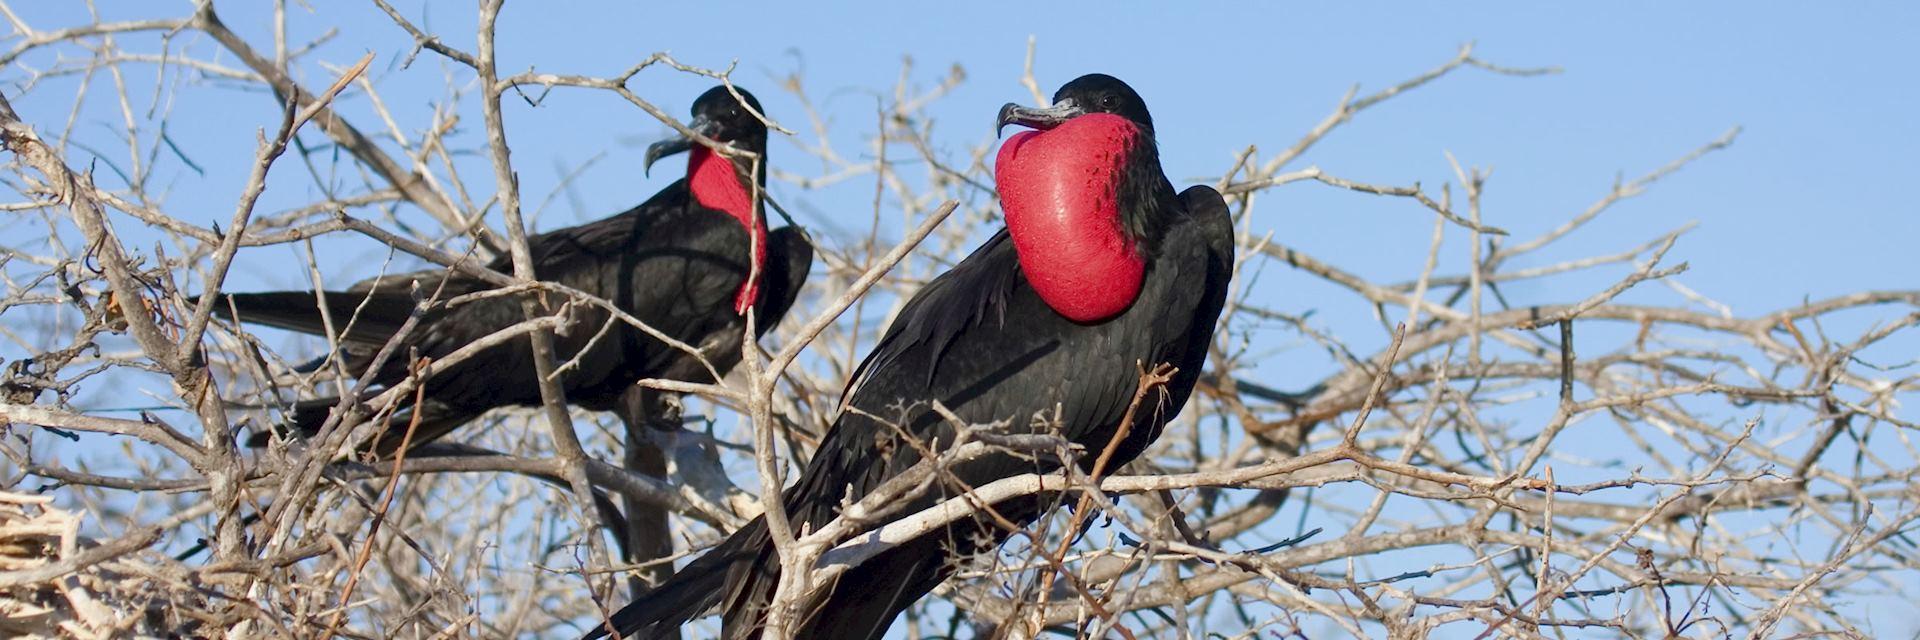 Frigate birds, The Galapagos Islands